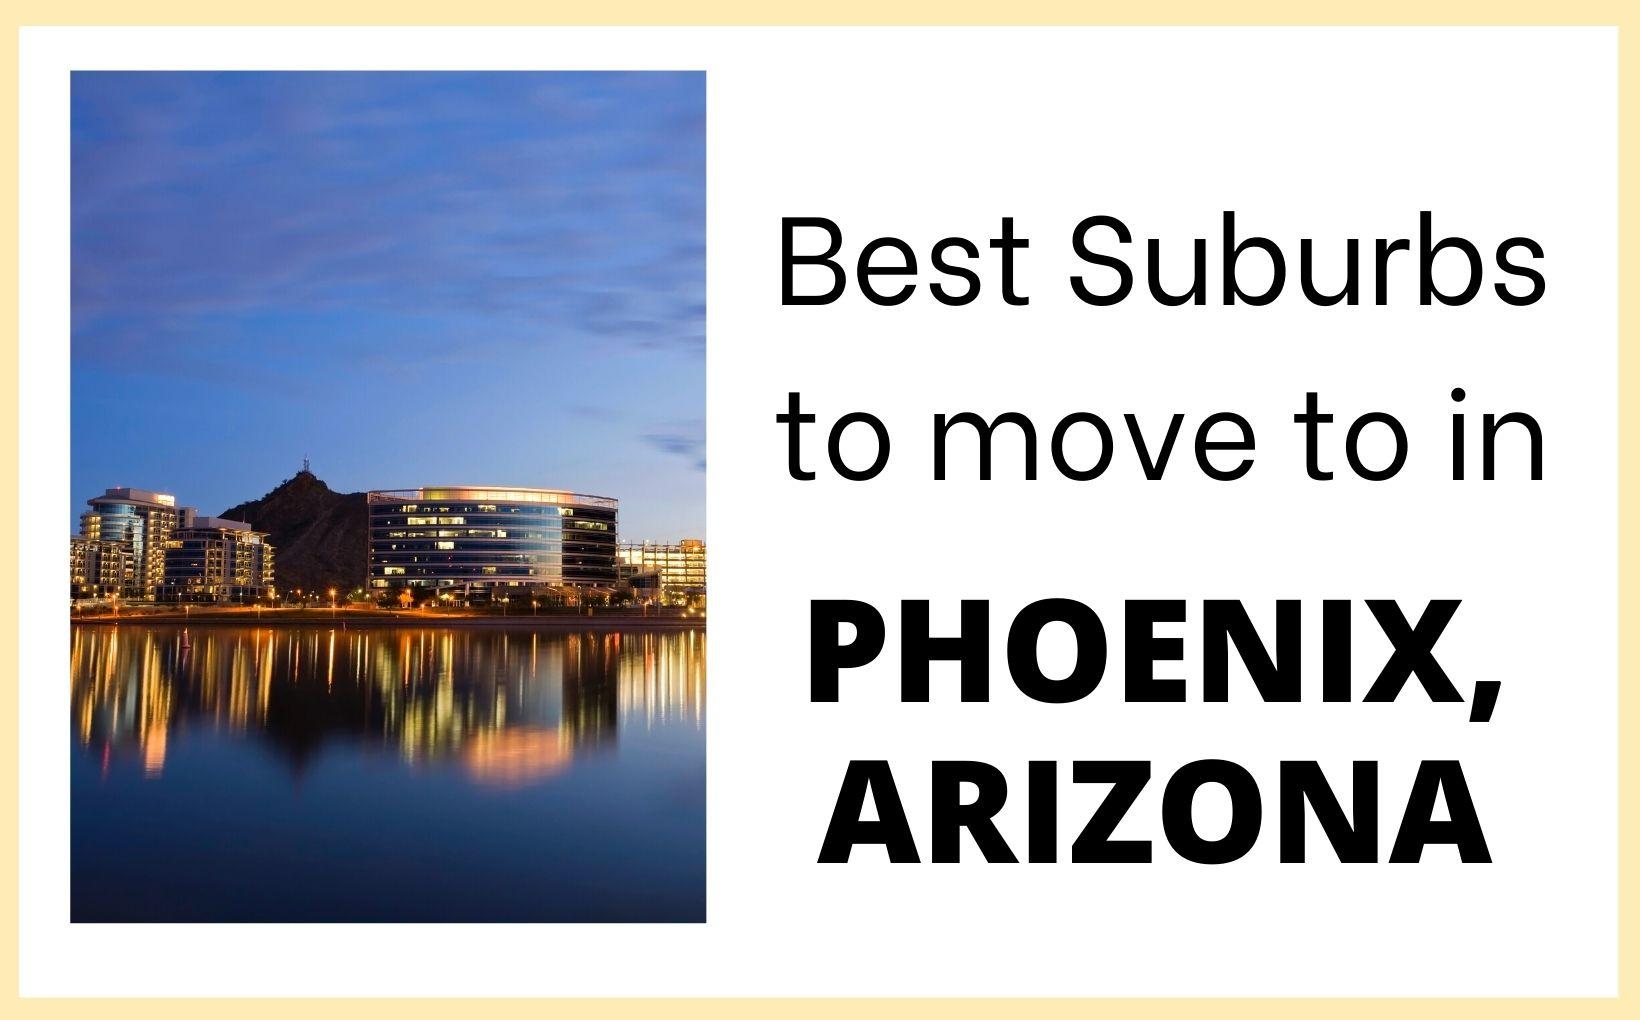 Best suburbs to move to in Phoenix Arizona